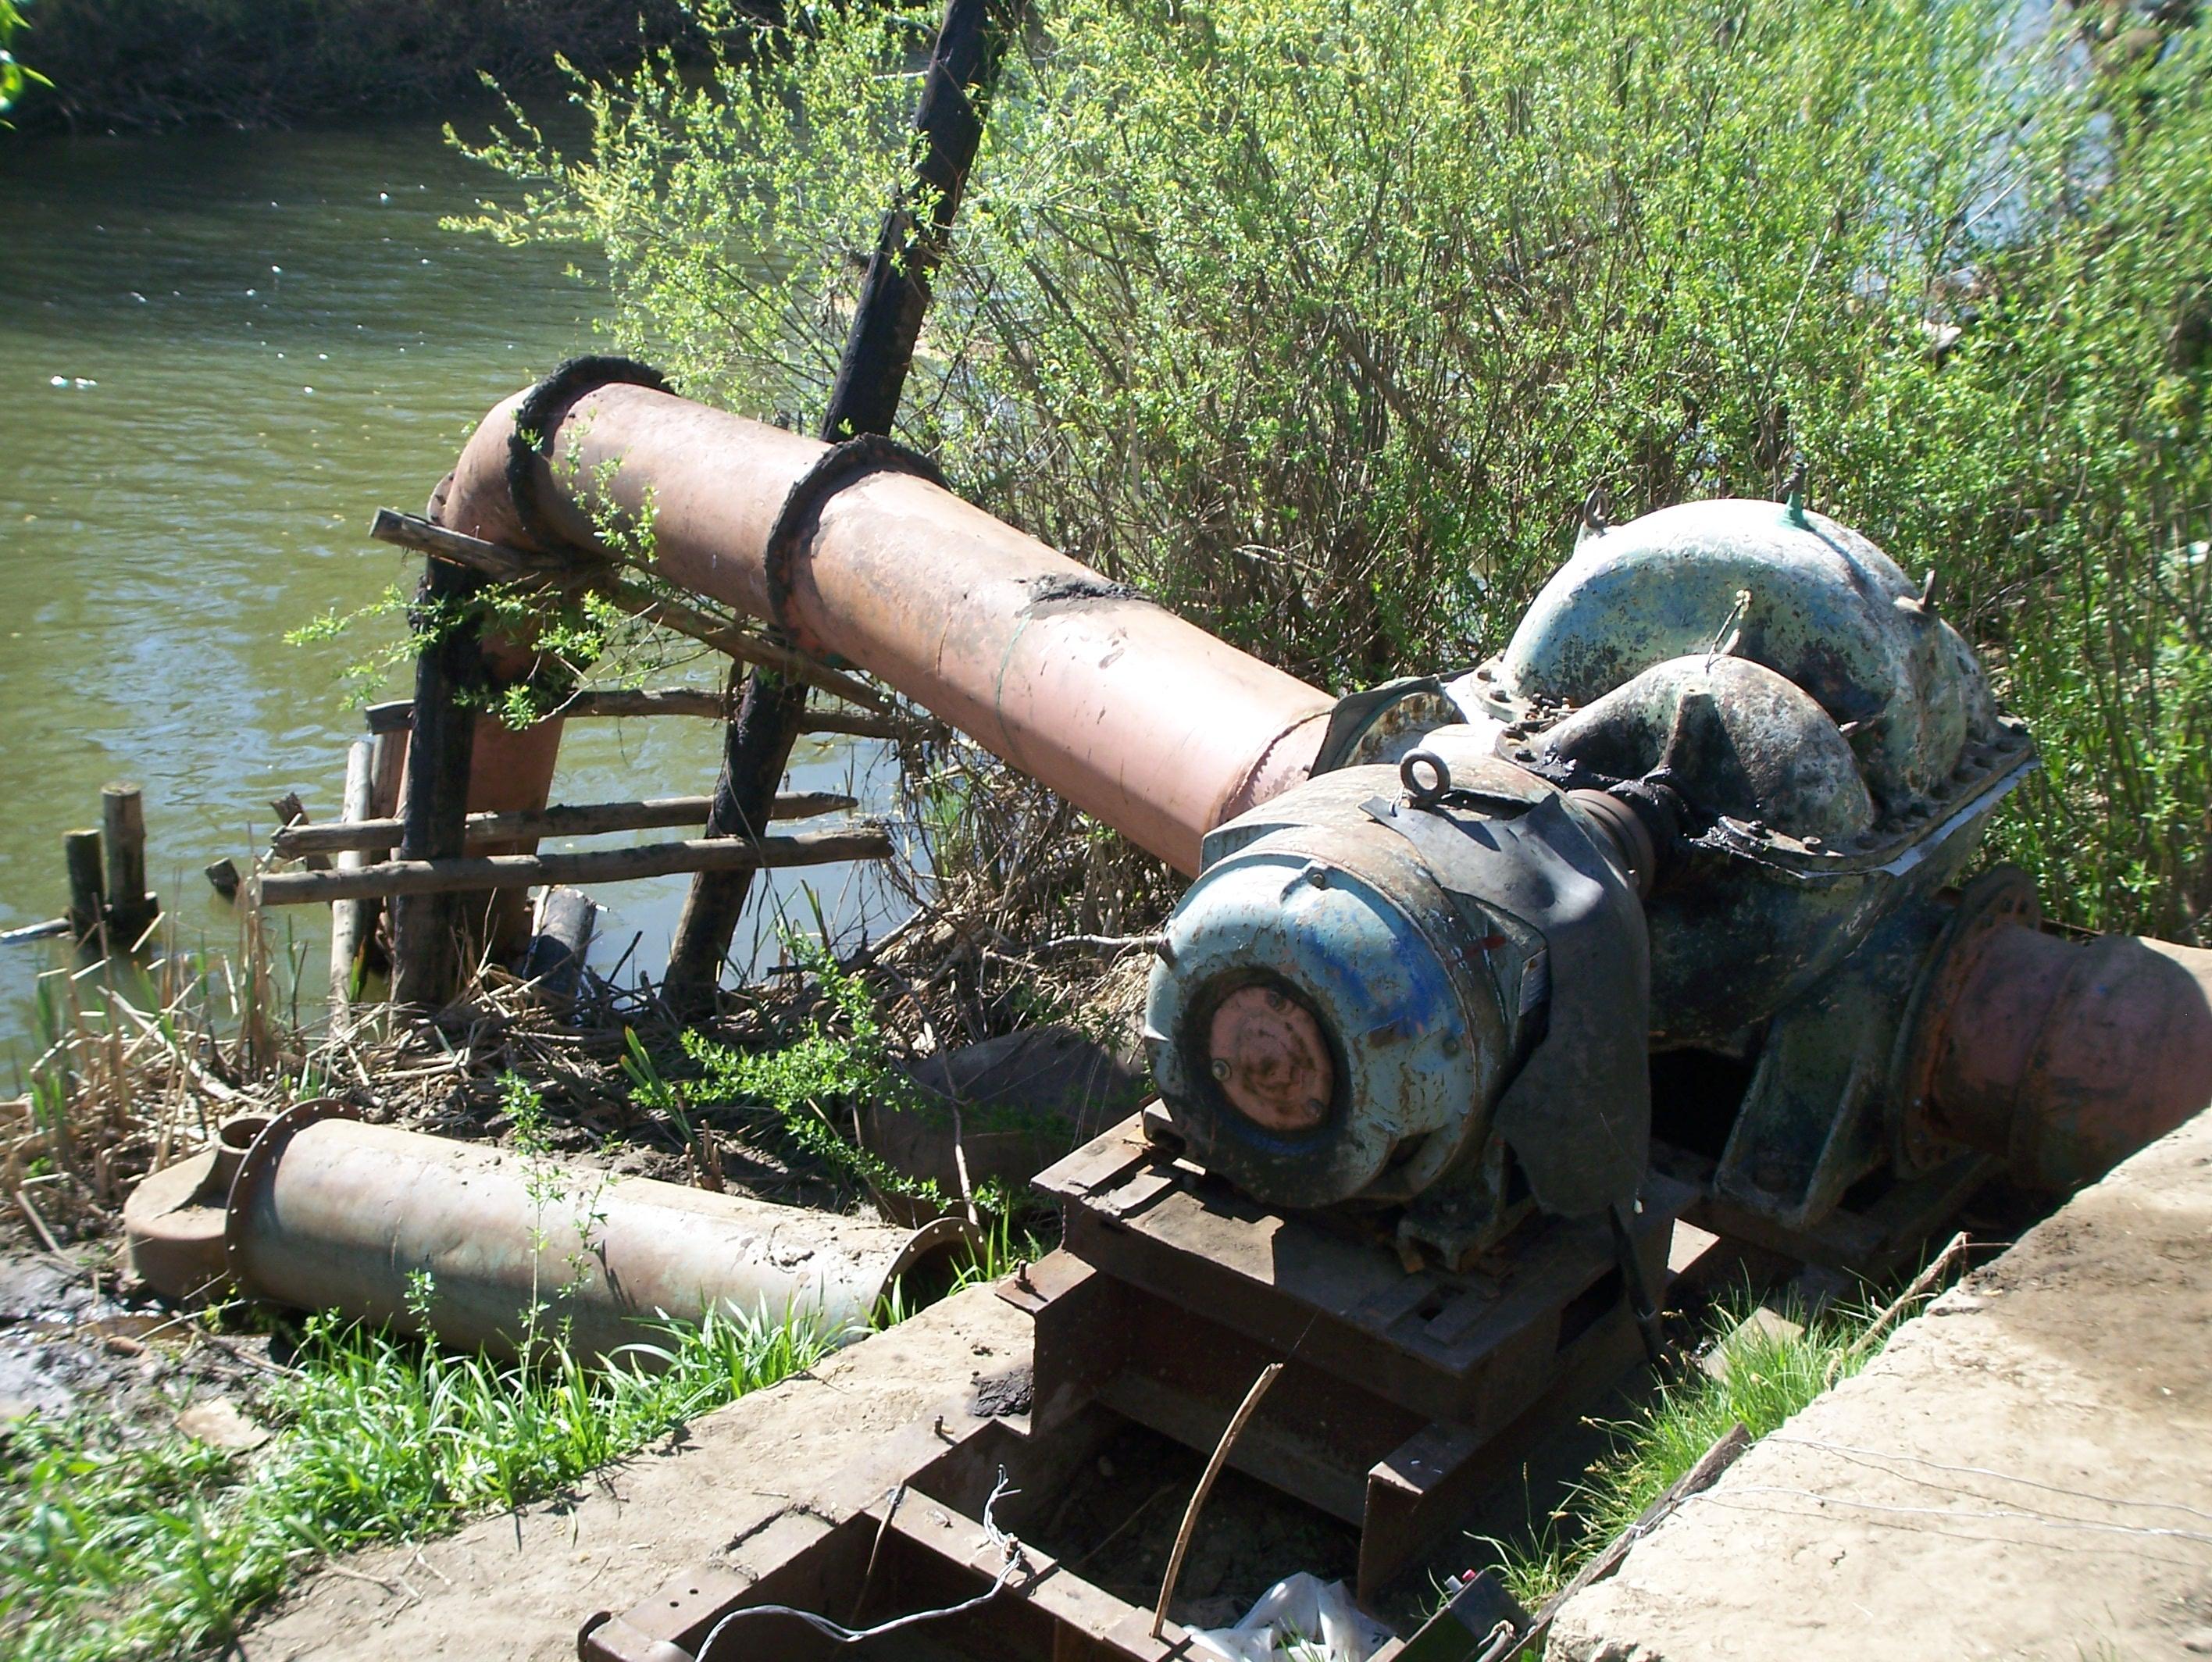 Russian Village: We Explore the Huge Carp Lake Pumps…